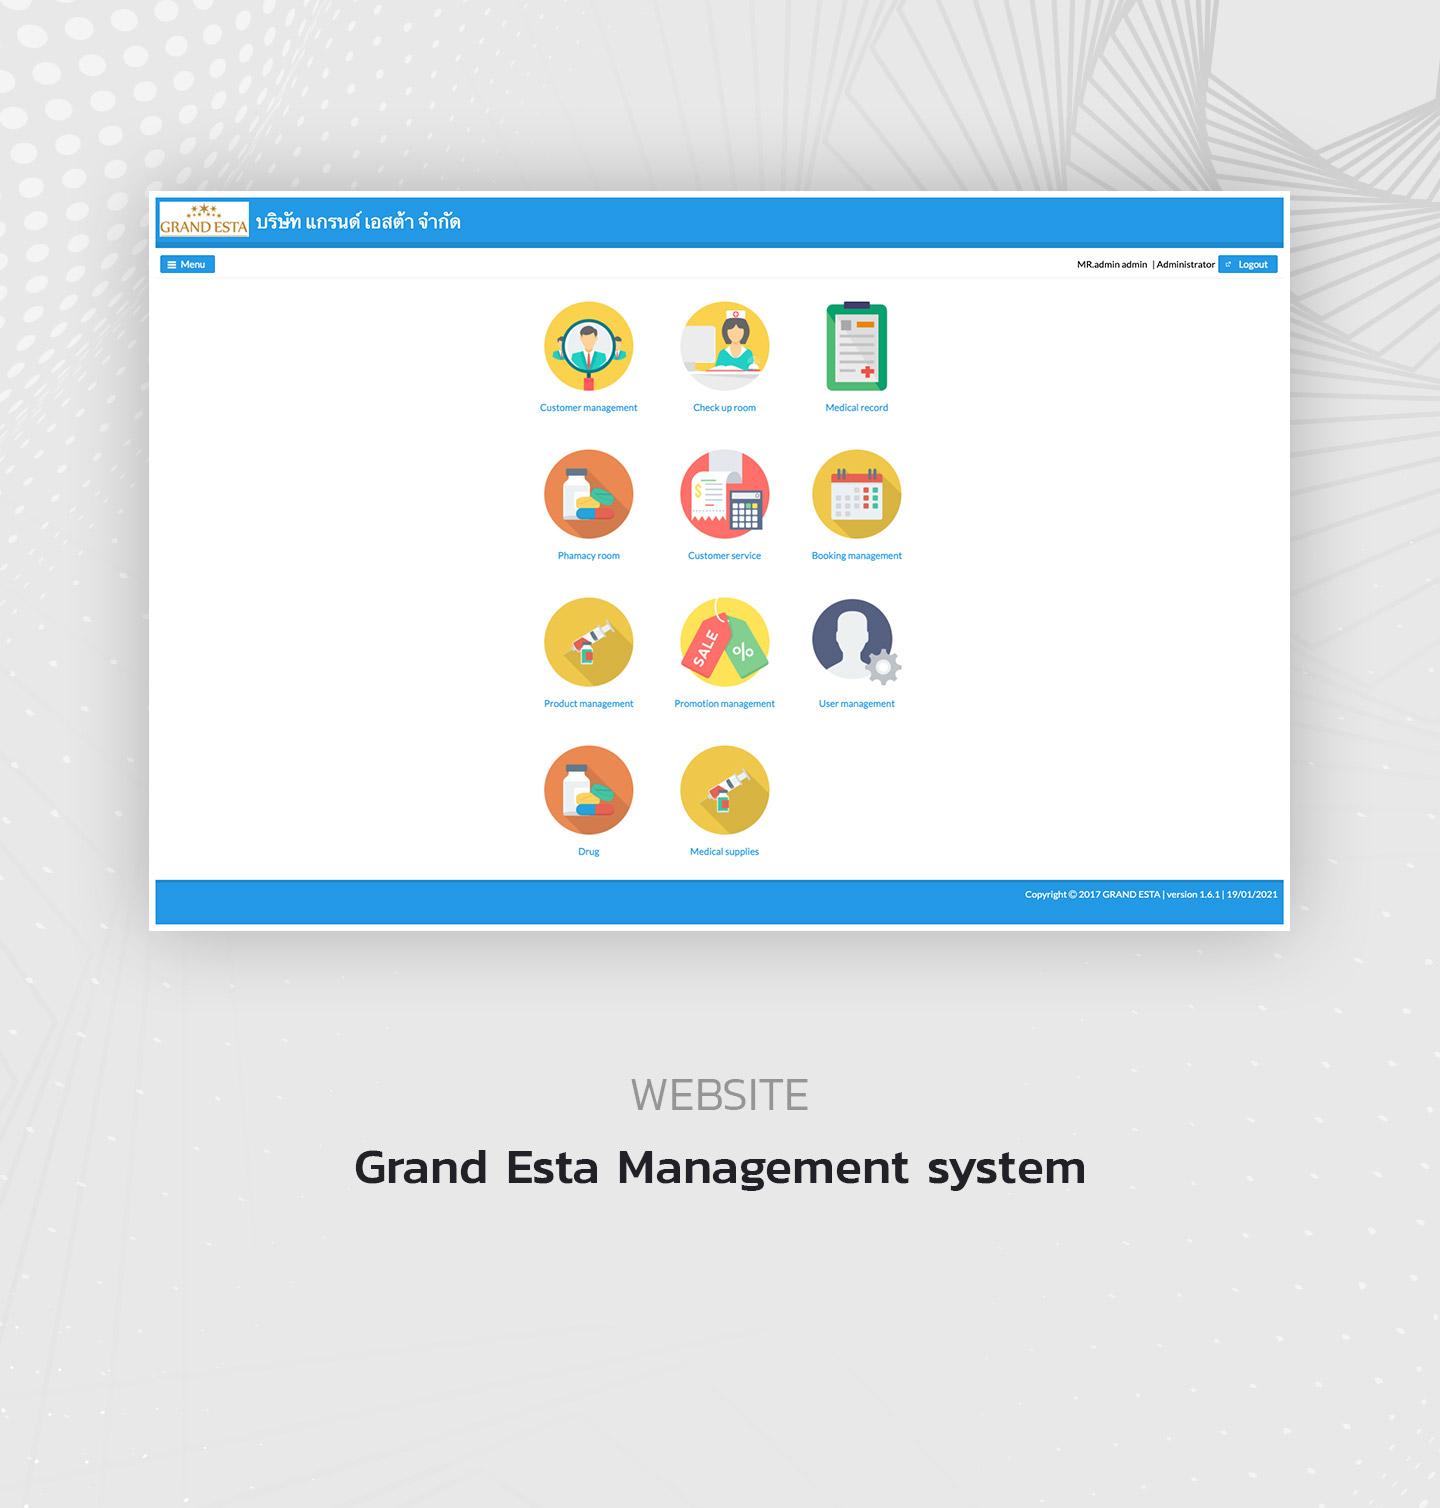 Grand Esta Management system